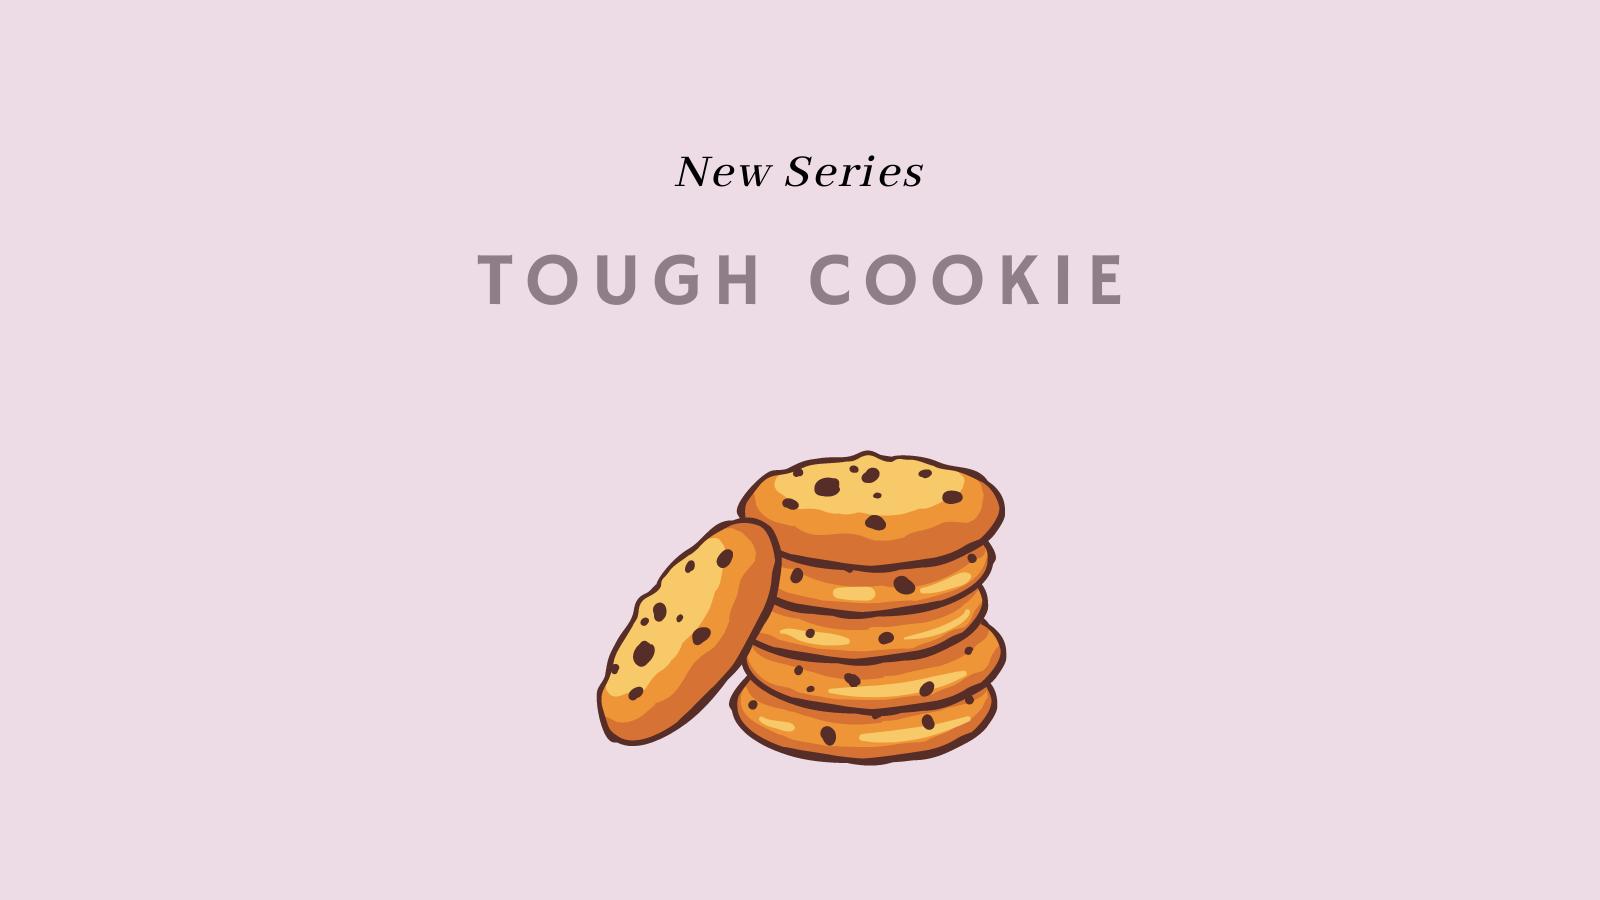 Tough Cookie Video Series